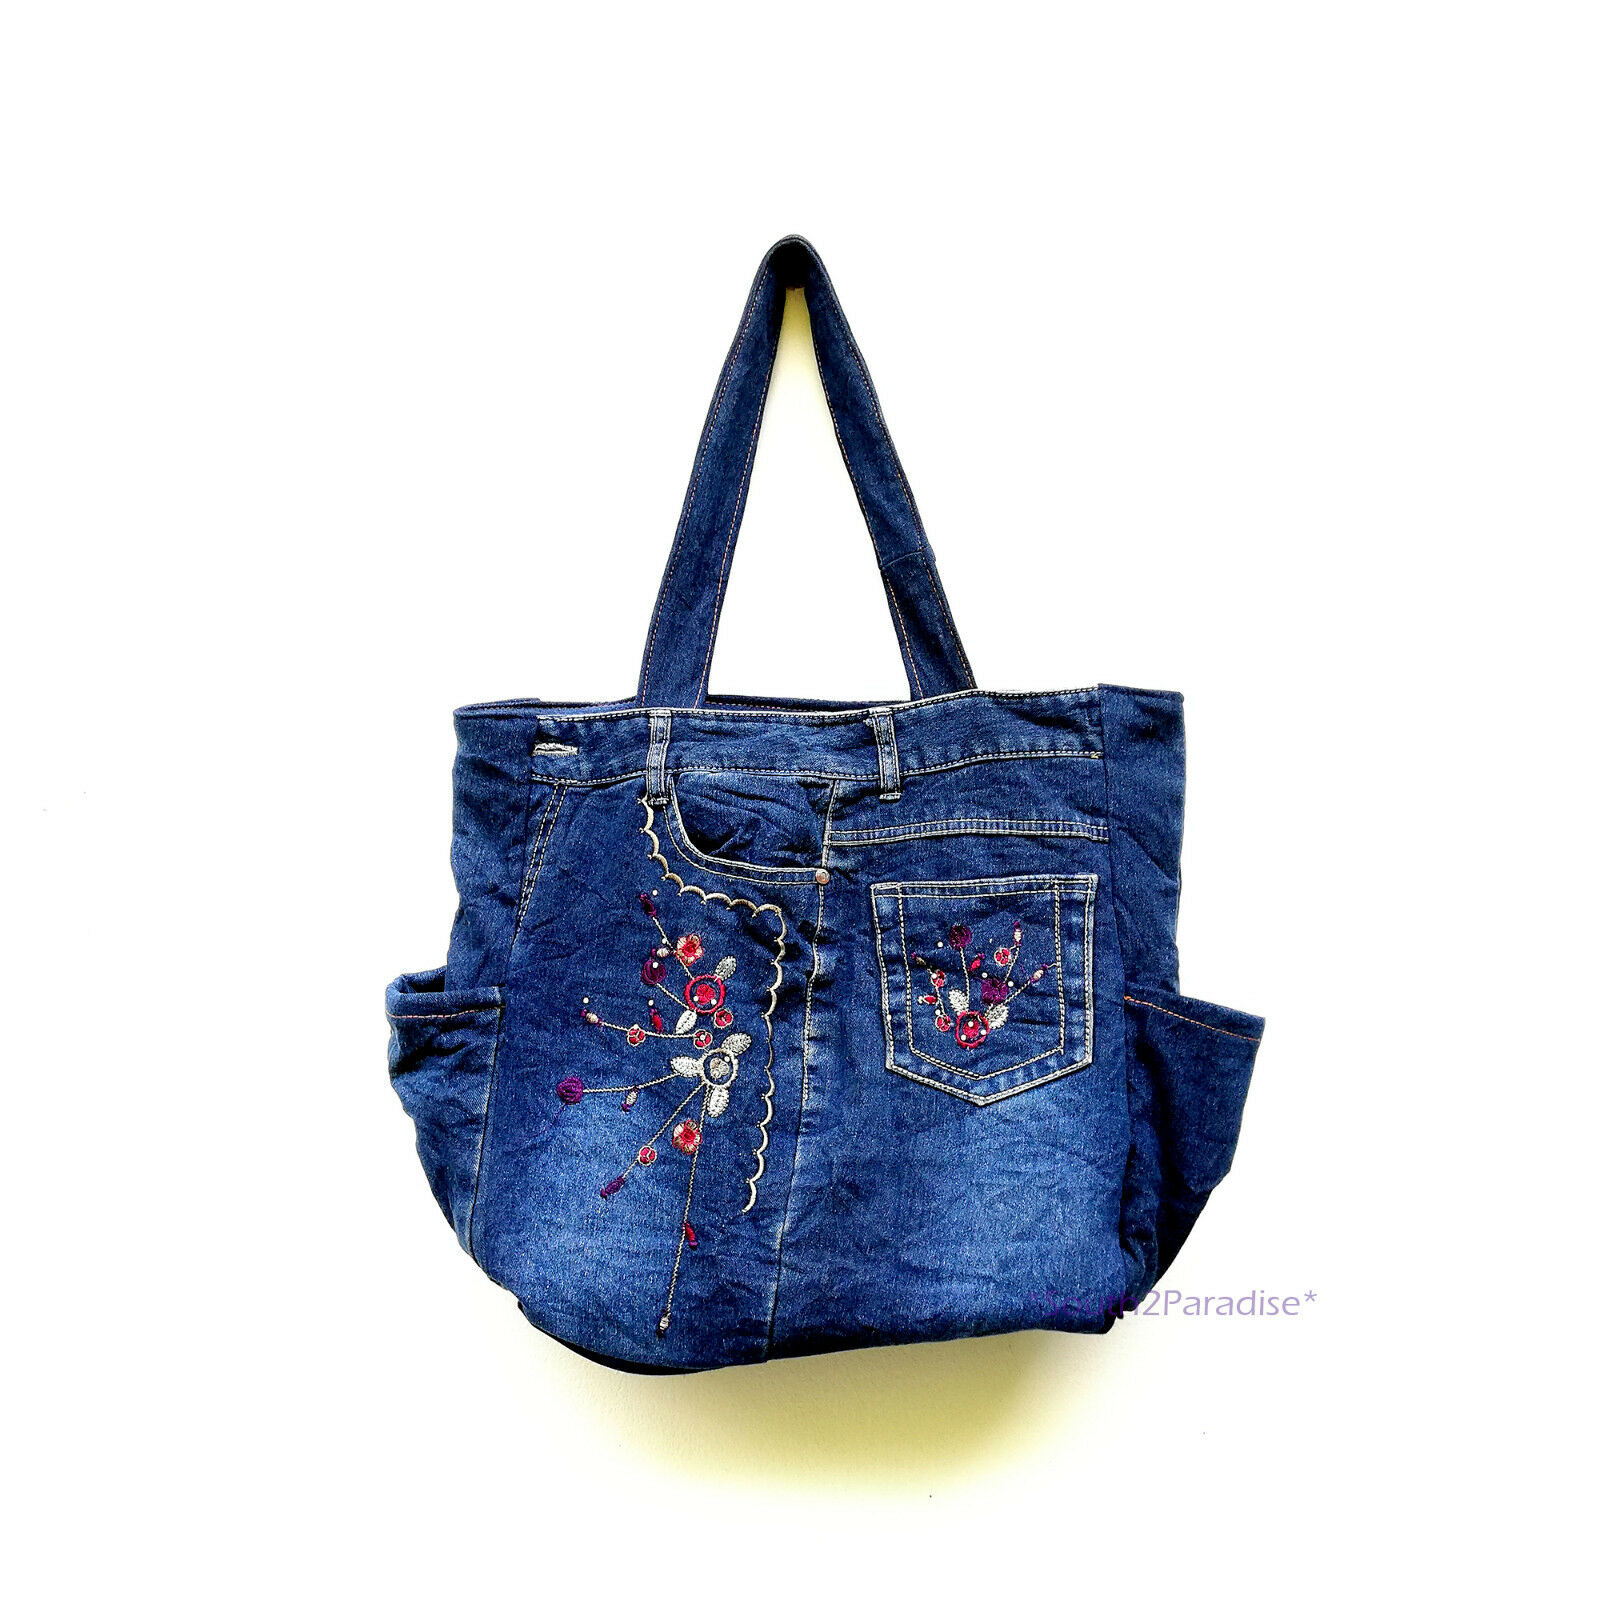 Details about Blue Jean Bag Recycled Denim Jeans Handmade Shoulder Tote  Woman Purse Handbag  6 9895763cd54eb